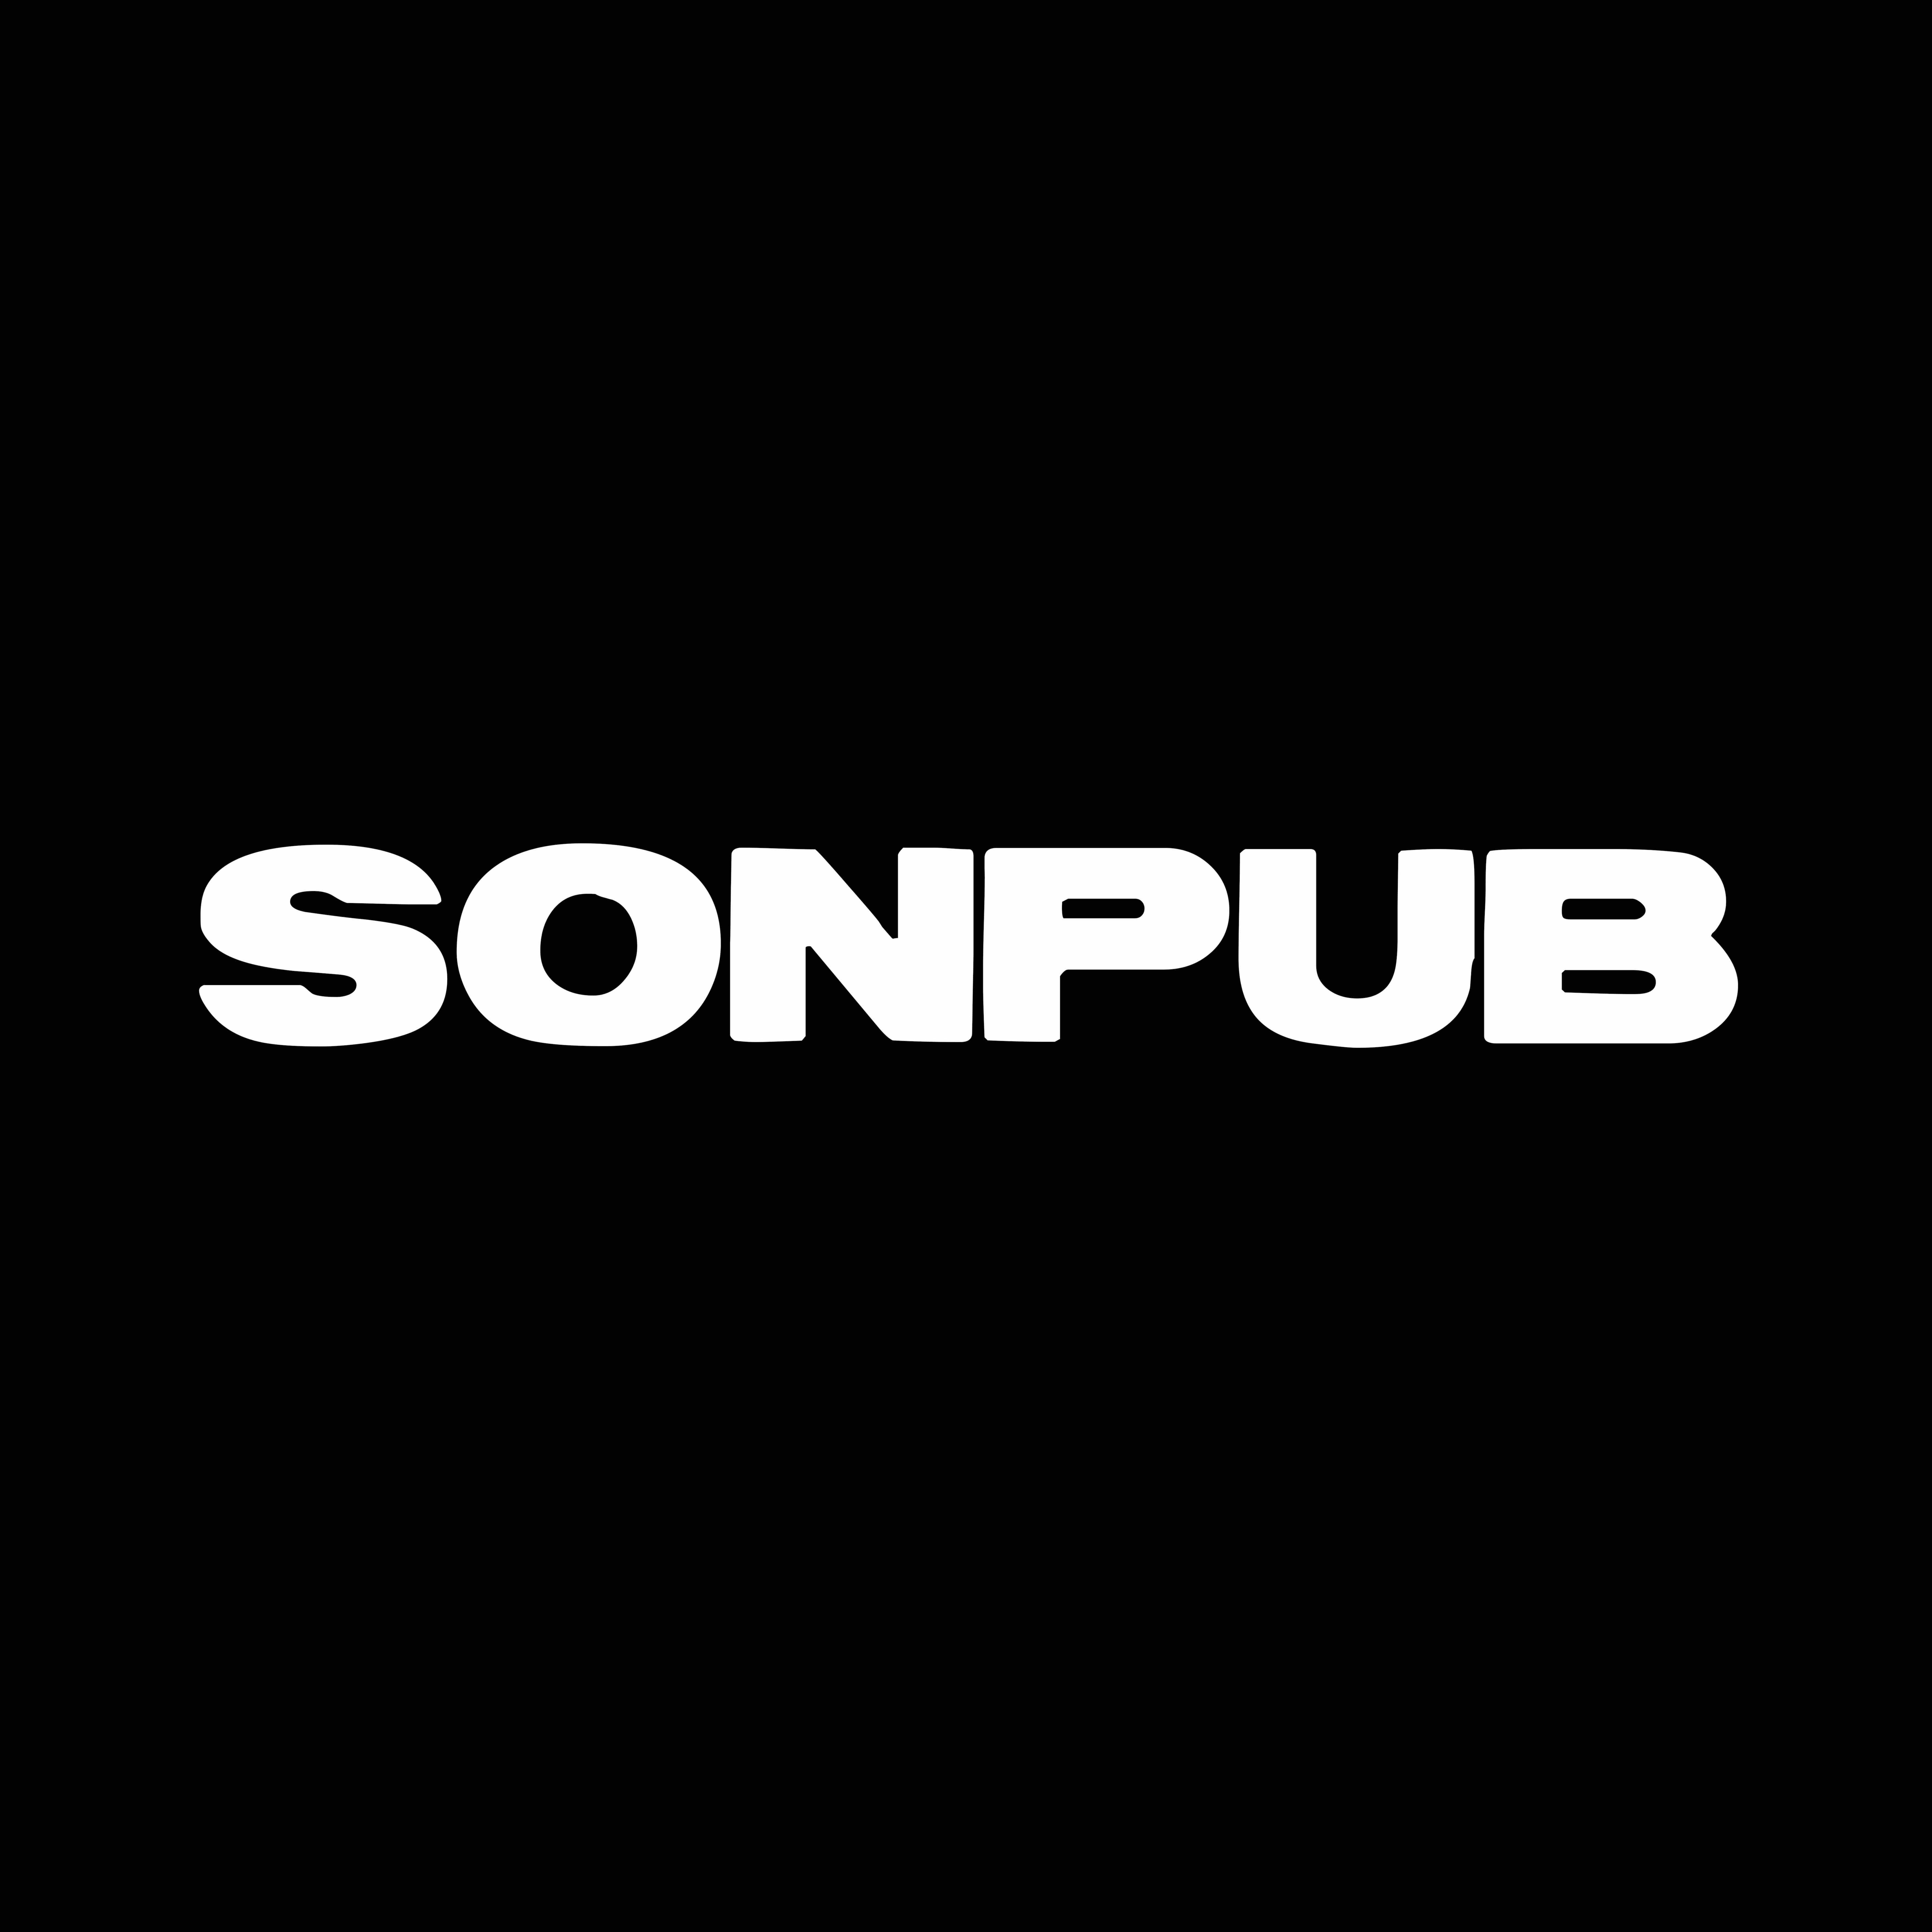 @sonpub Profile Image | Linktree